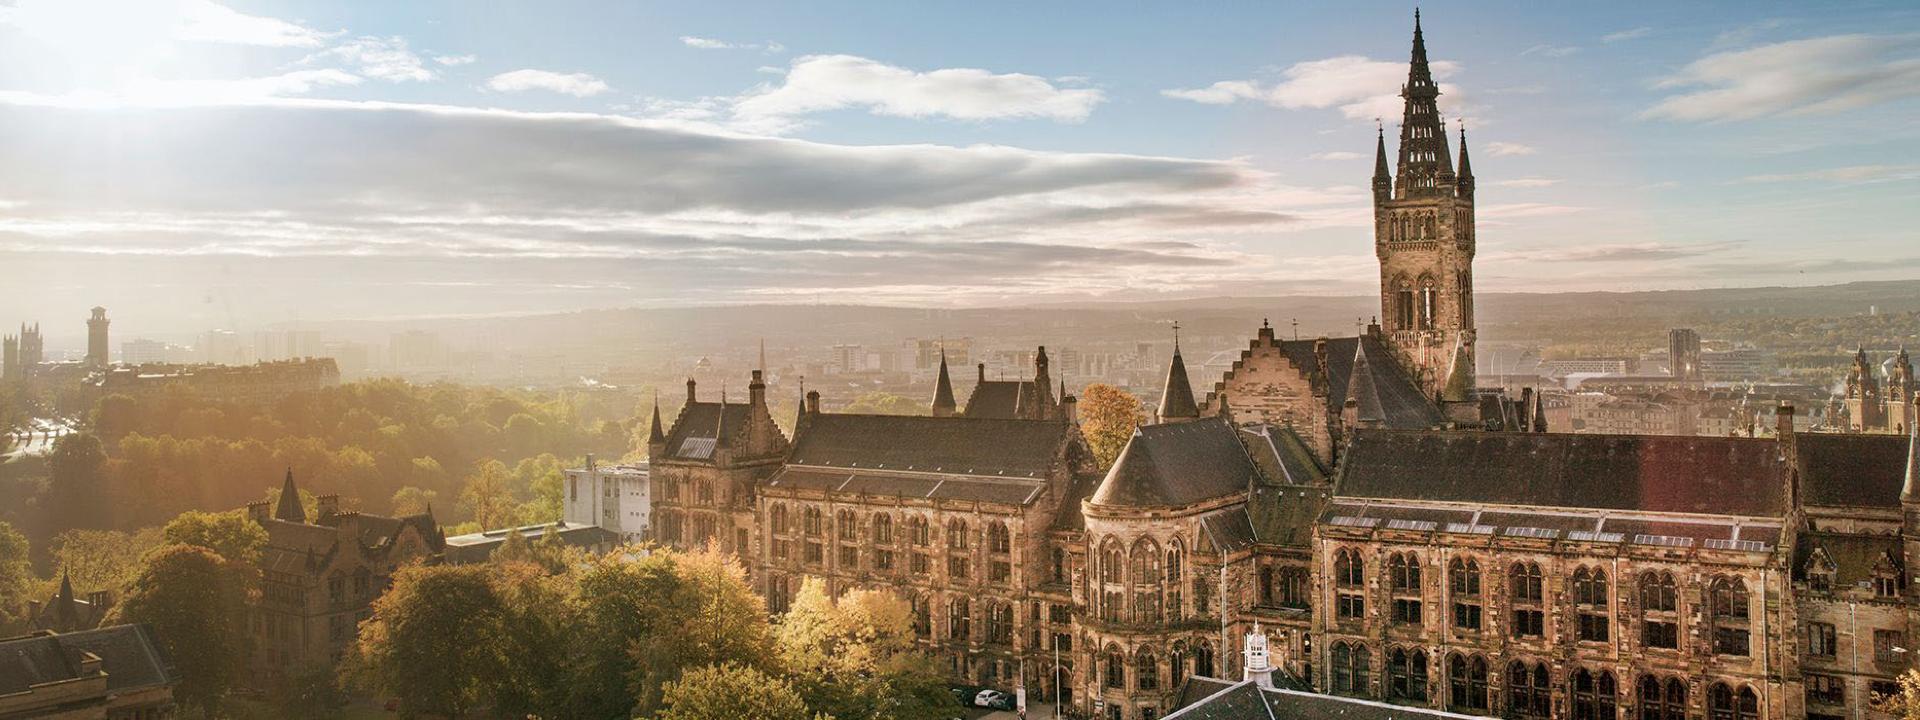 University of Glasgow - CLARK (MILE-END) BURSARY FUND